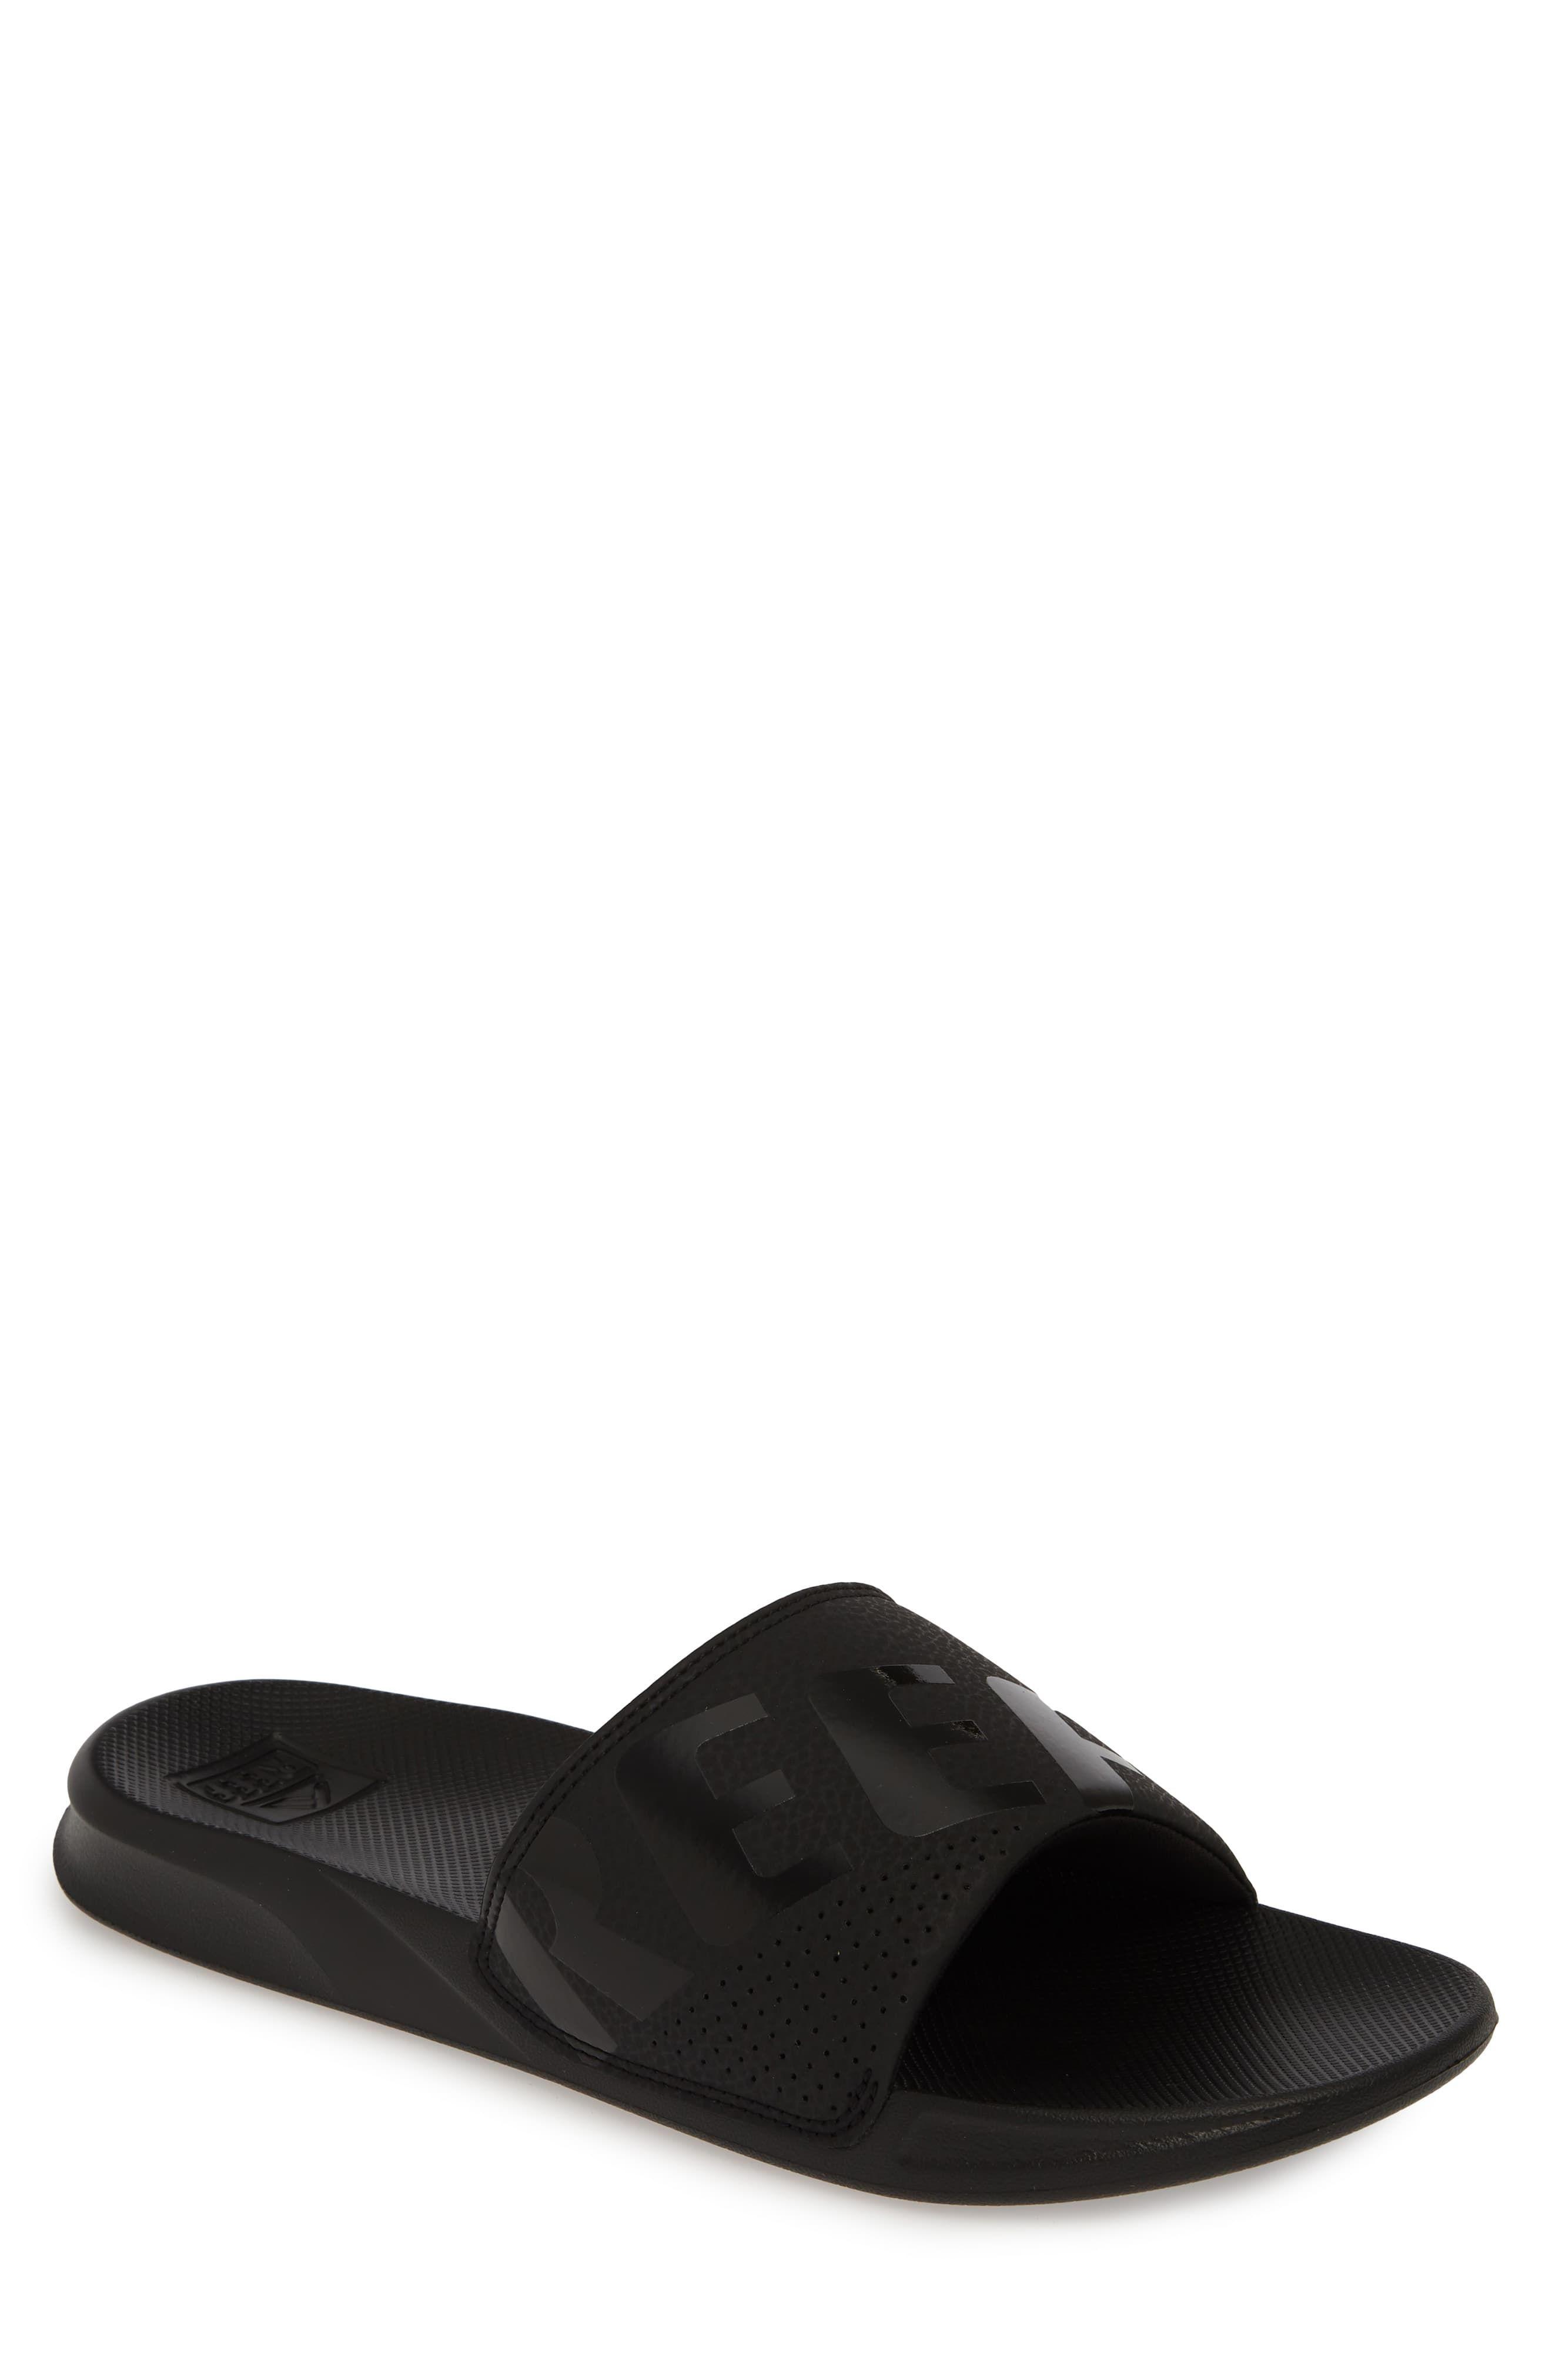 da3fc97de1c1e Reef One Slide Sandal in 2019 | Products | Slide sandals, Sandals ...